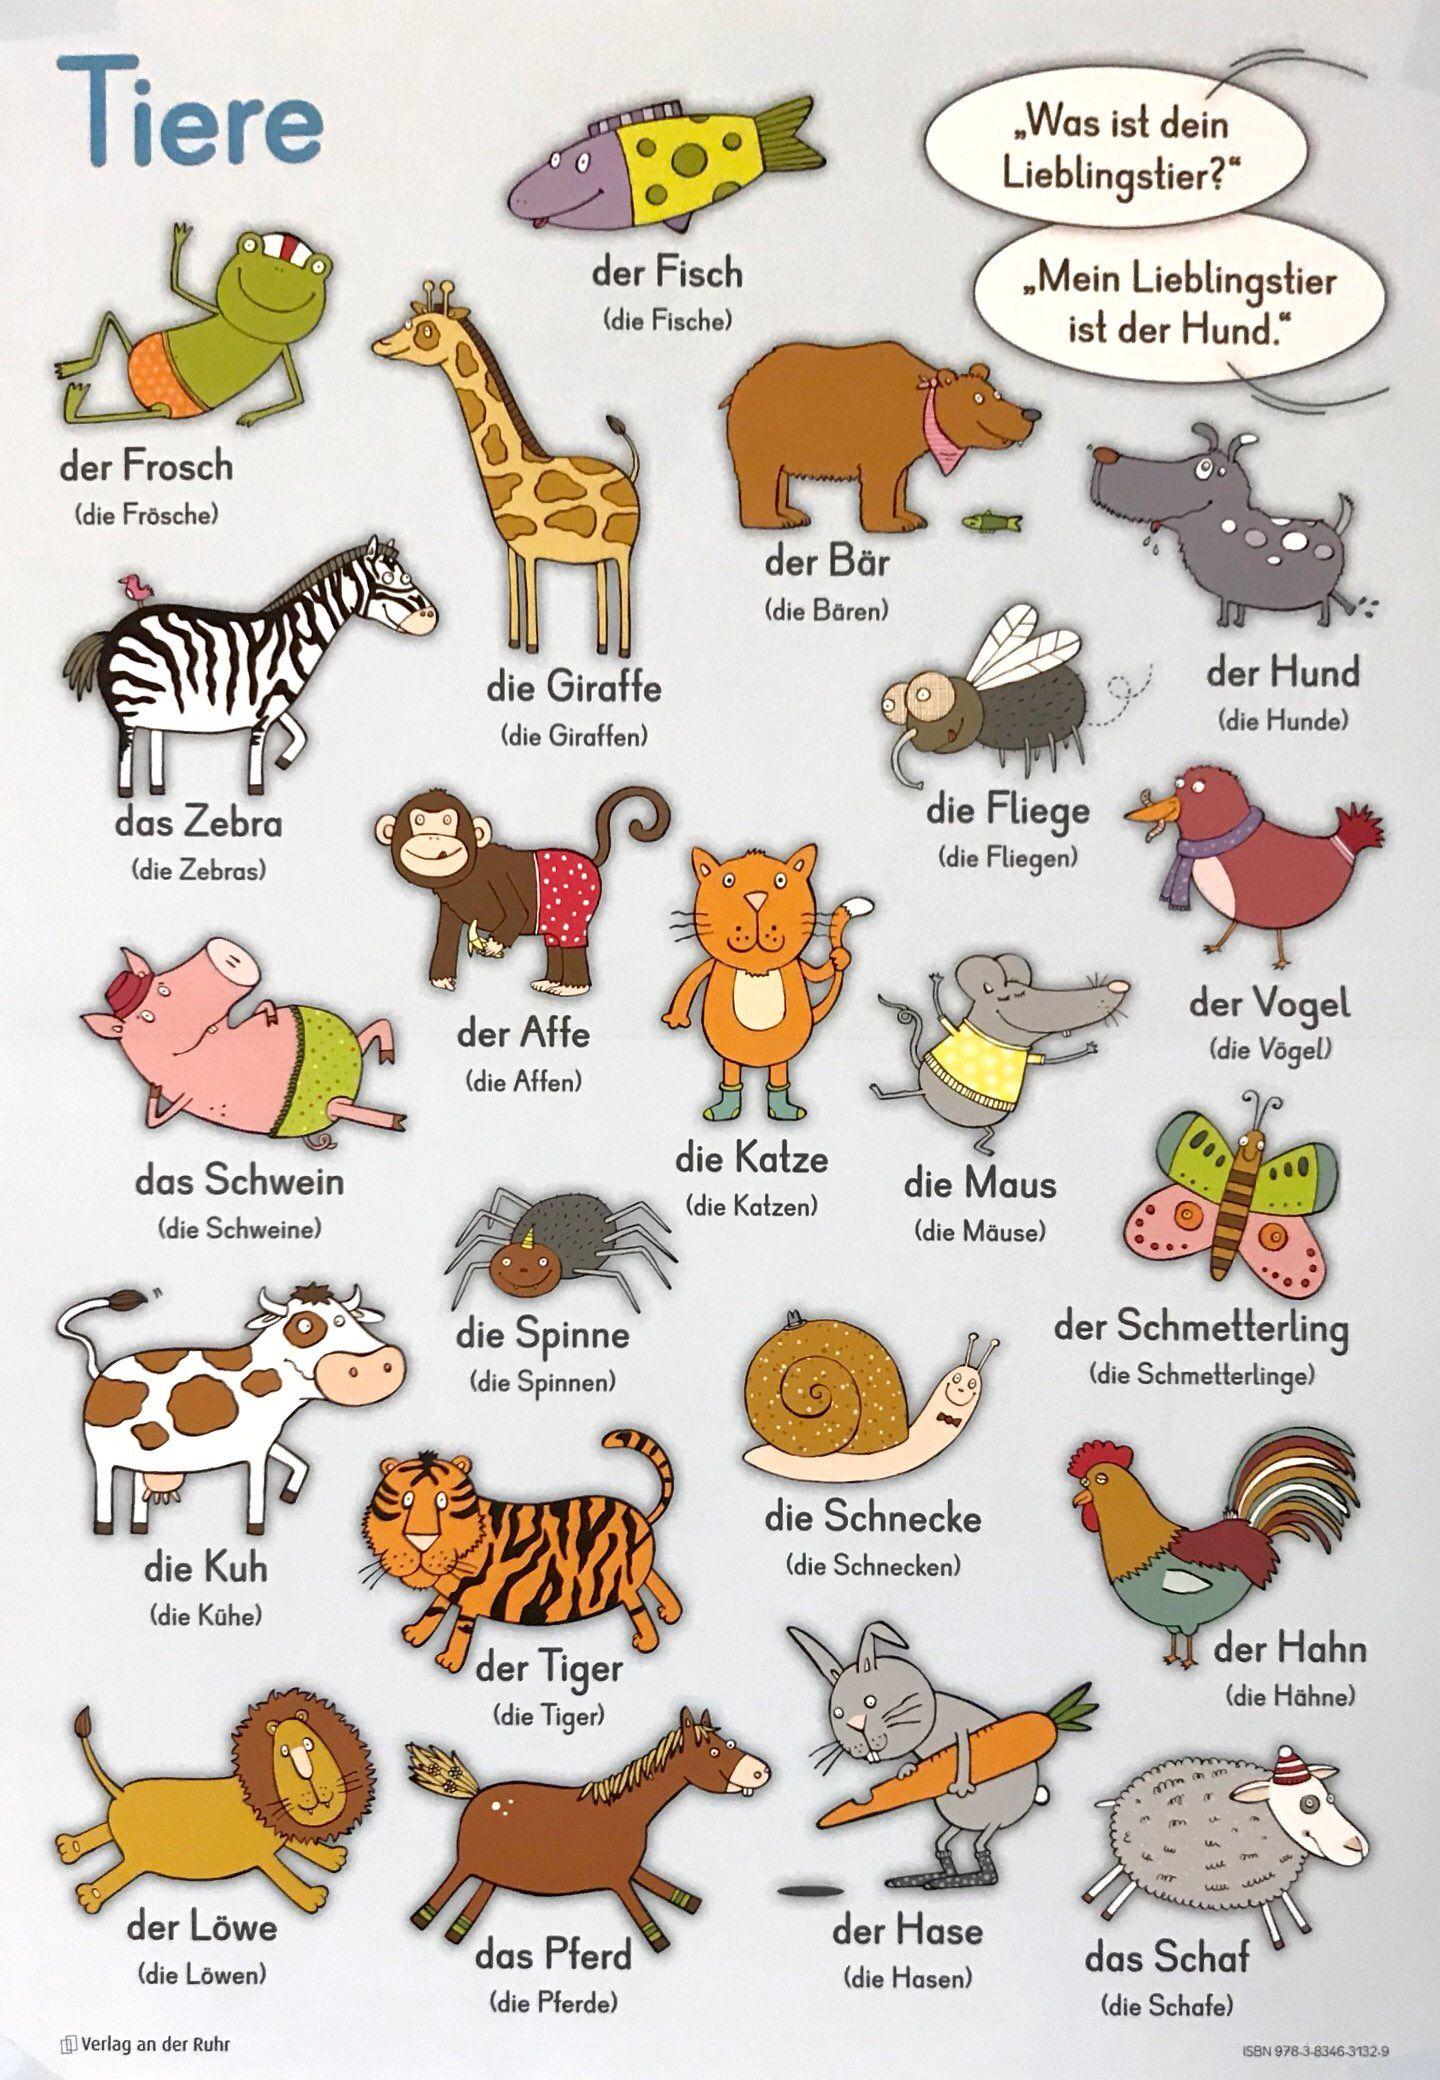 German Vocabulary For Animals